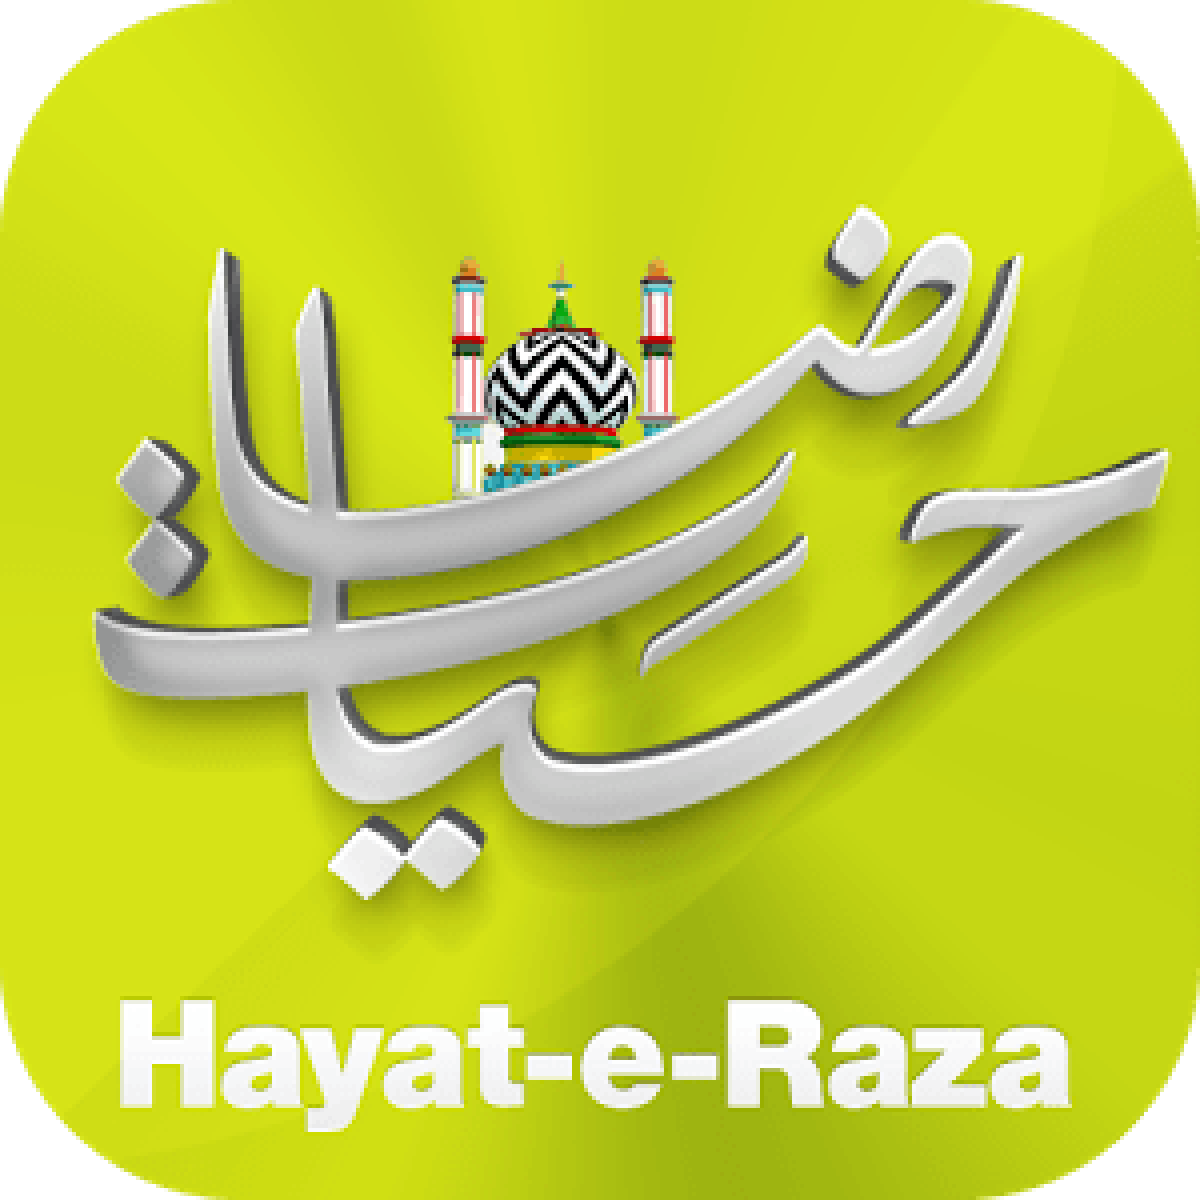 Hayat-e-Raza 1.0.0